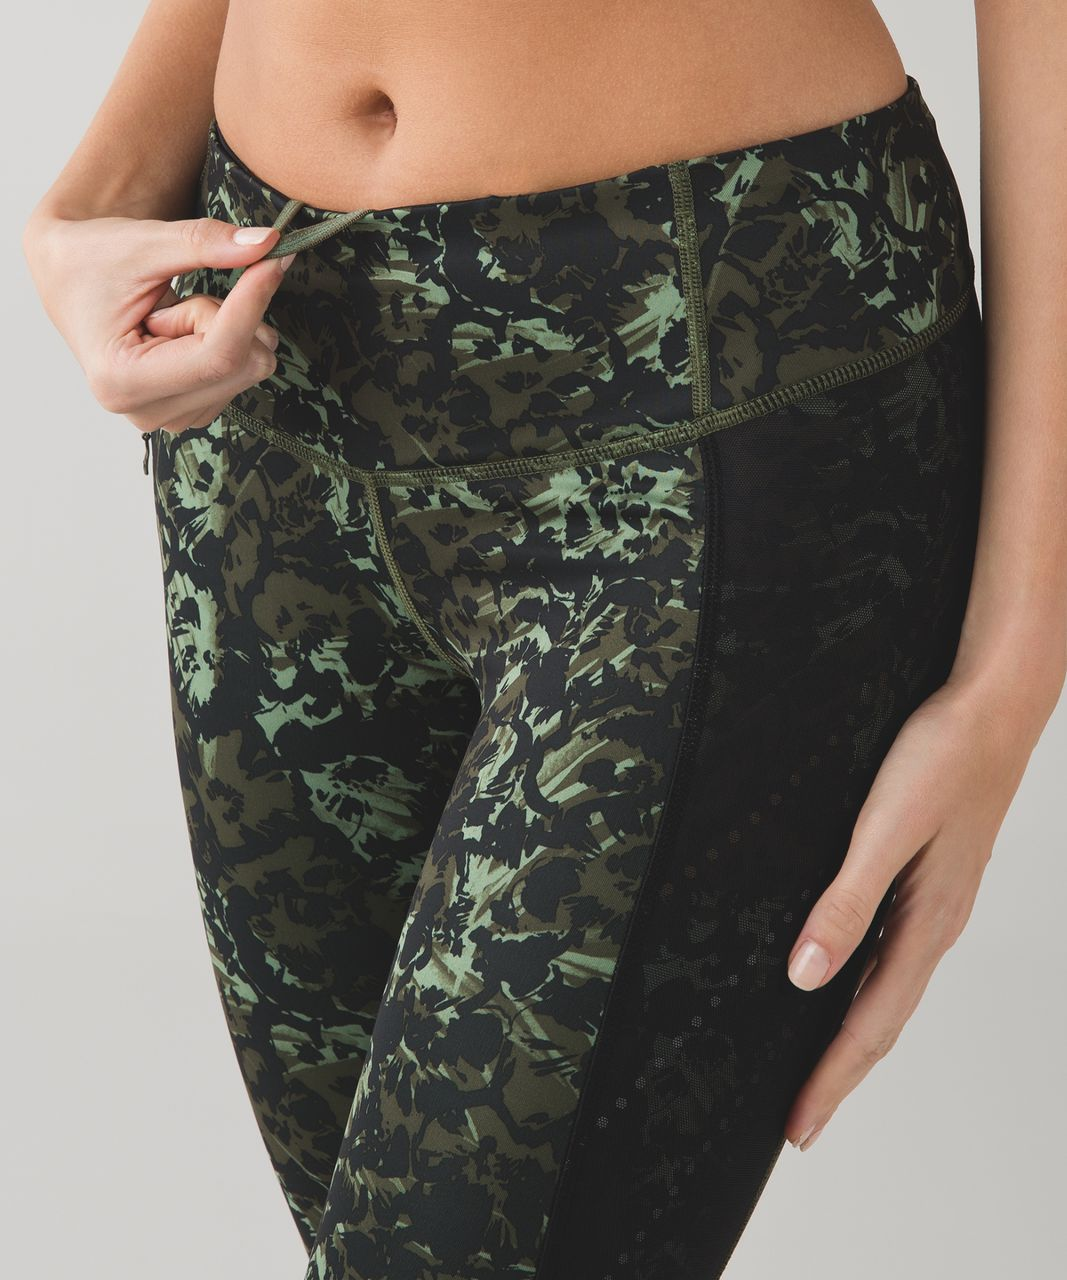 Lululemon Stop At Nothing Crop *Full-On Luxtreme - Fleur Sombre Desert Olive Fatigue Green / Black